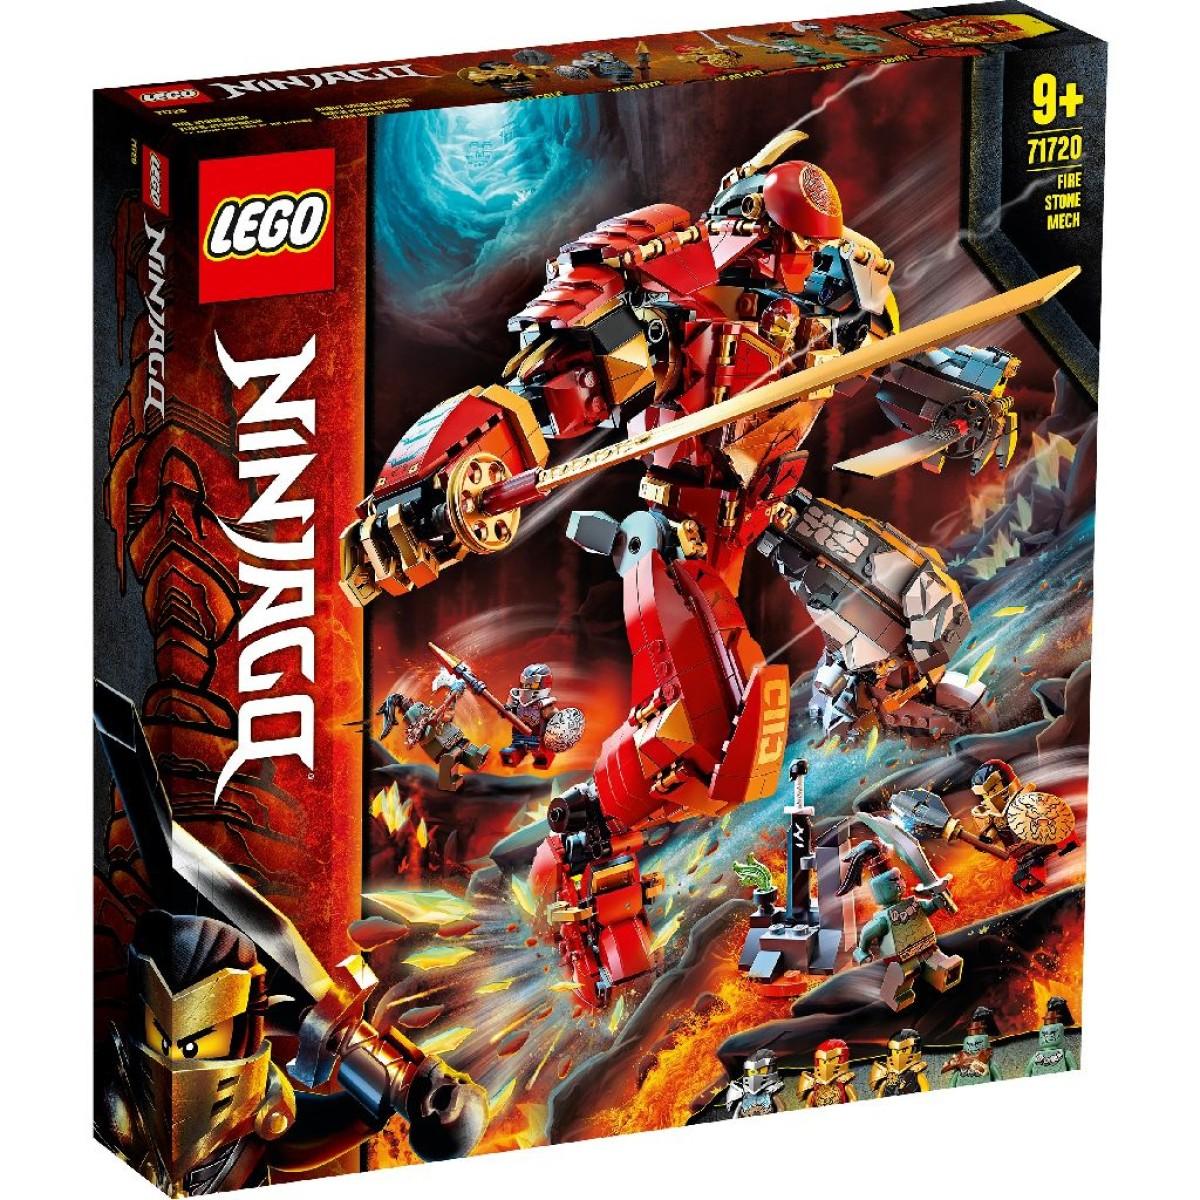 LEGO Ninjago Fire Stone Mech 71720 - Game On Toymaster Store